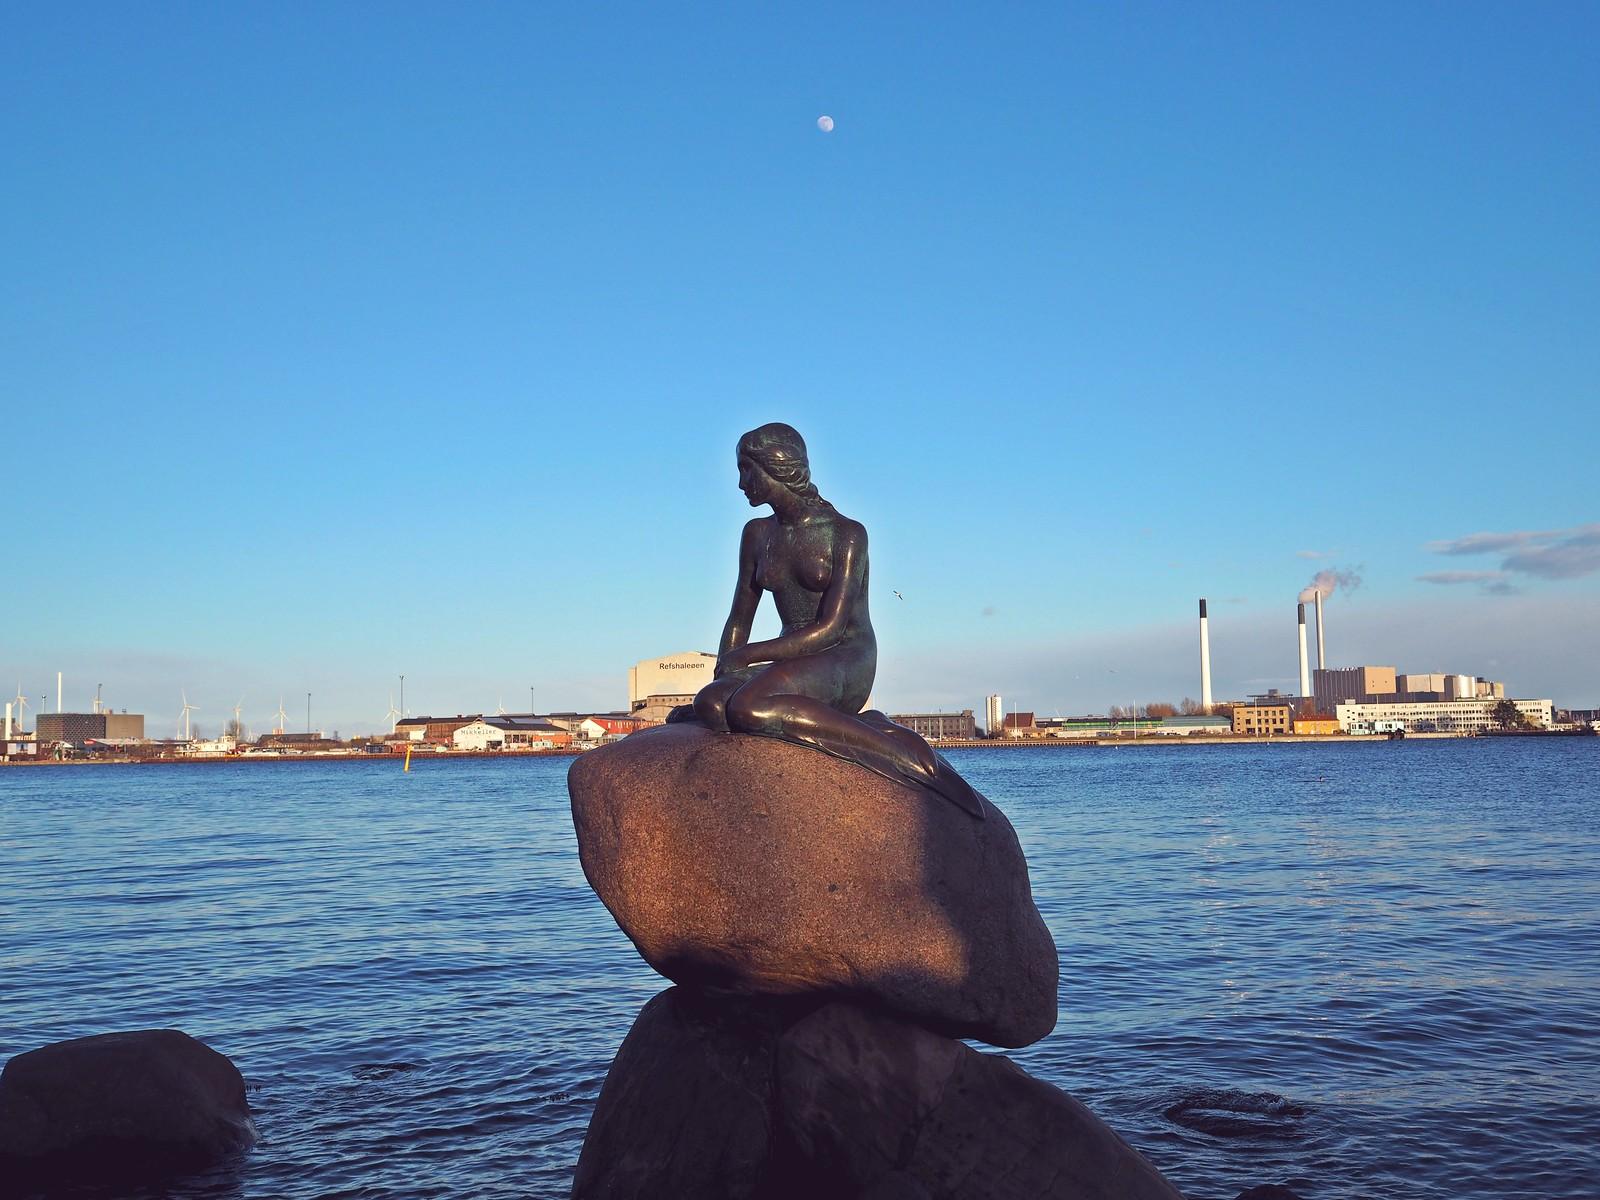 pieni merenneito patsas kööpenhamina tanska